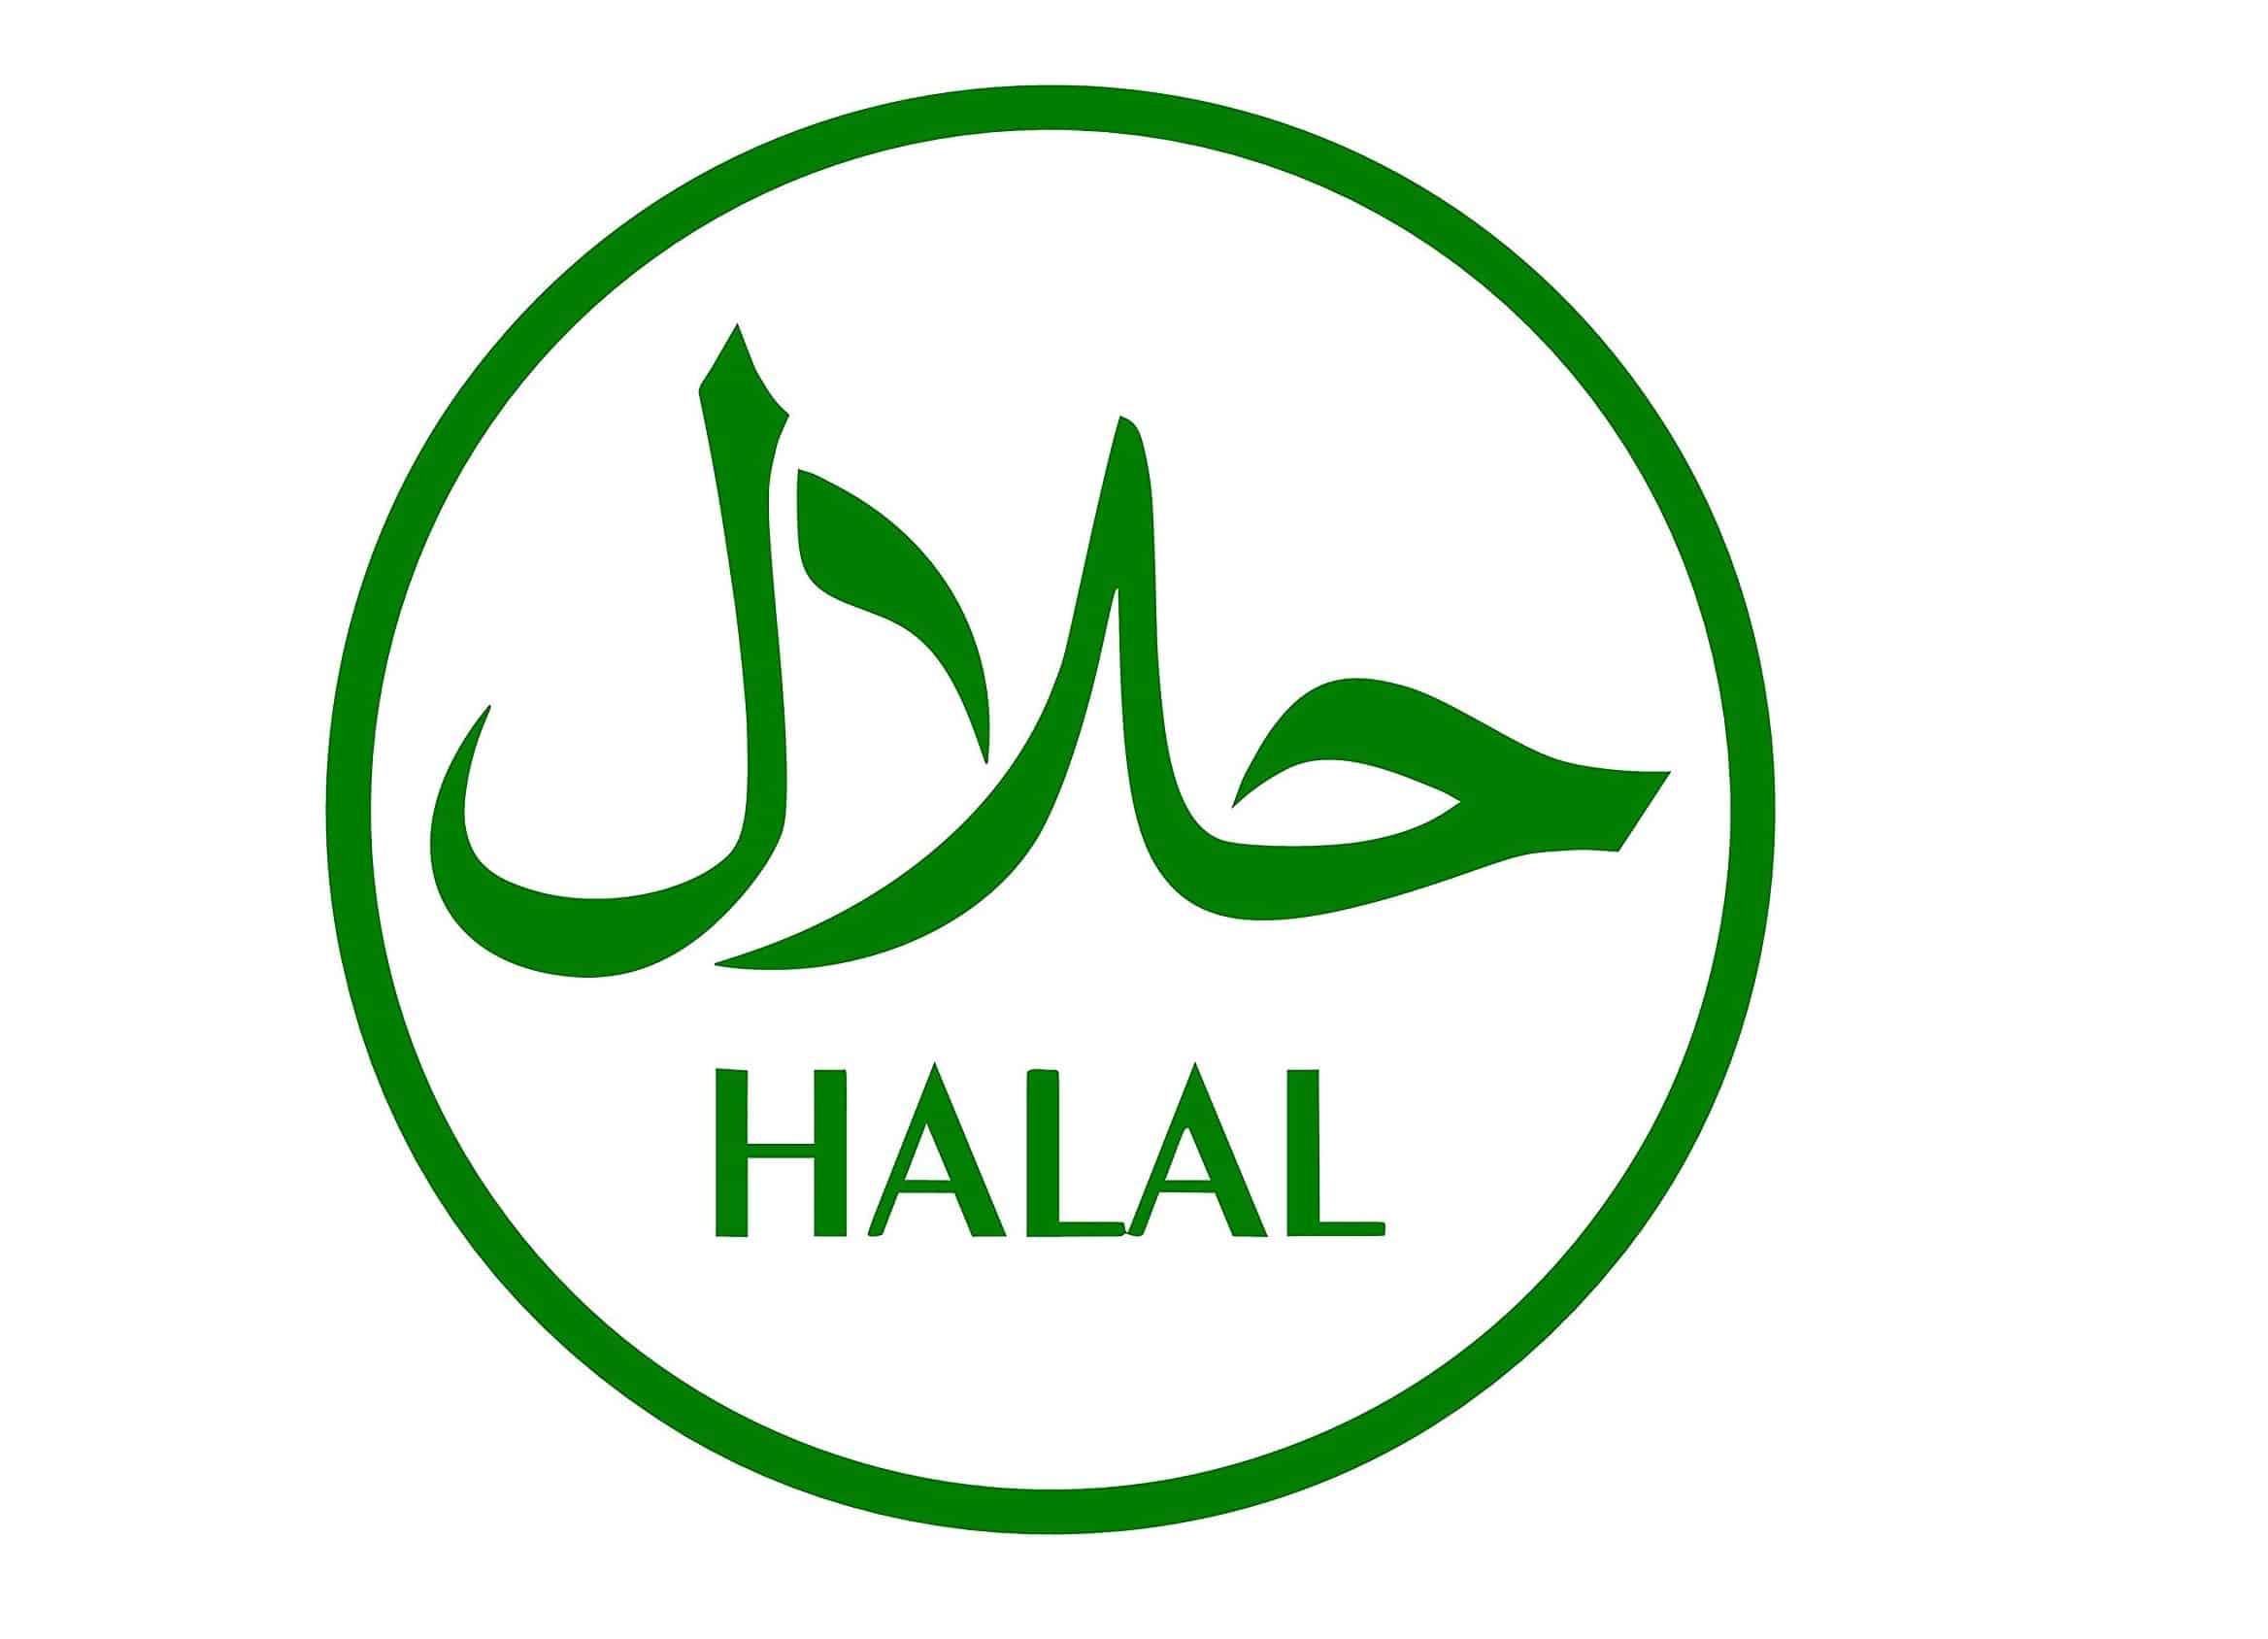 Pilihlah-Produk-Henna-Yang-Memang-Sudah-Berlabel-Halal